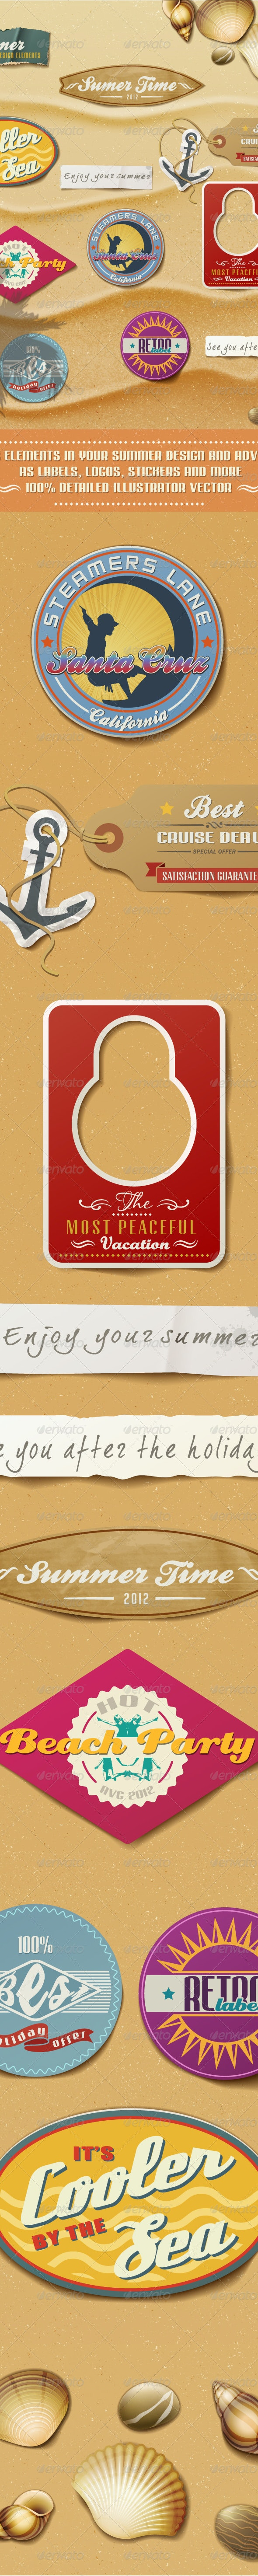 Summer Design Elements On Sand Background. - Seasons/Holidays Conceptual